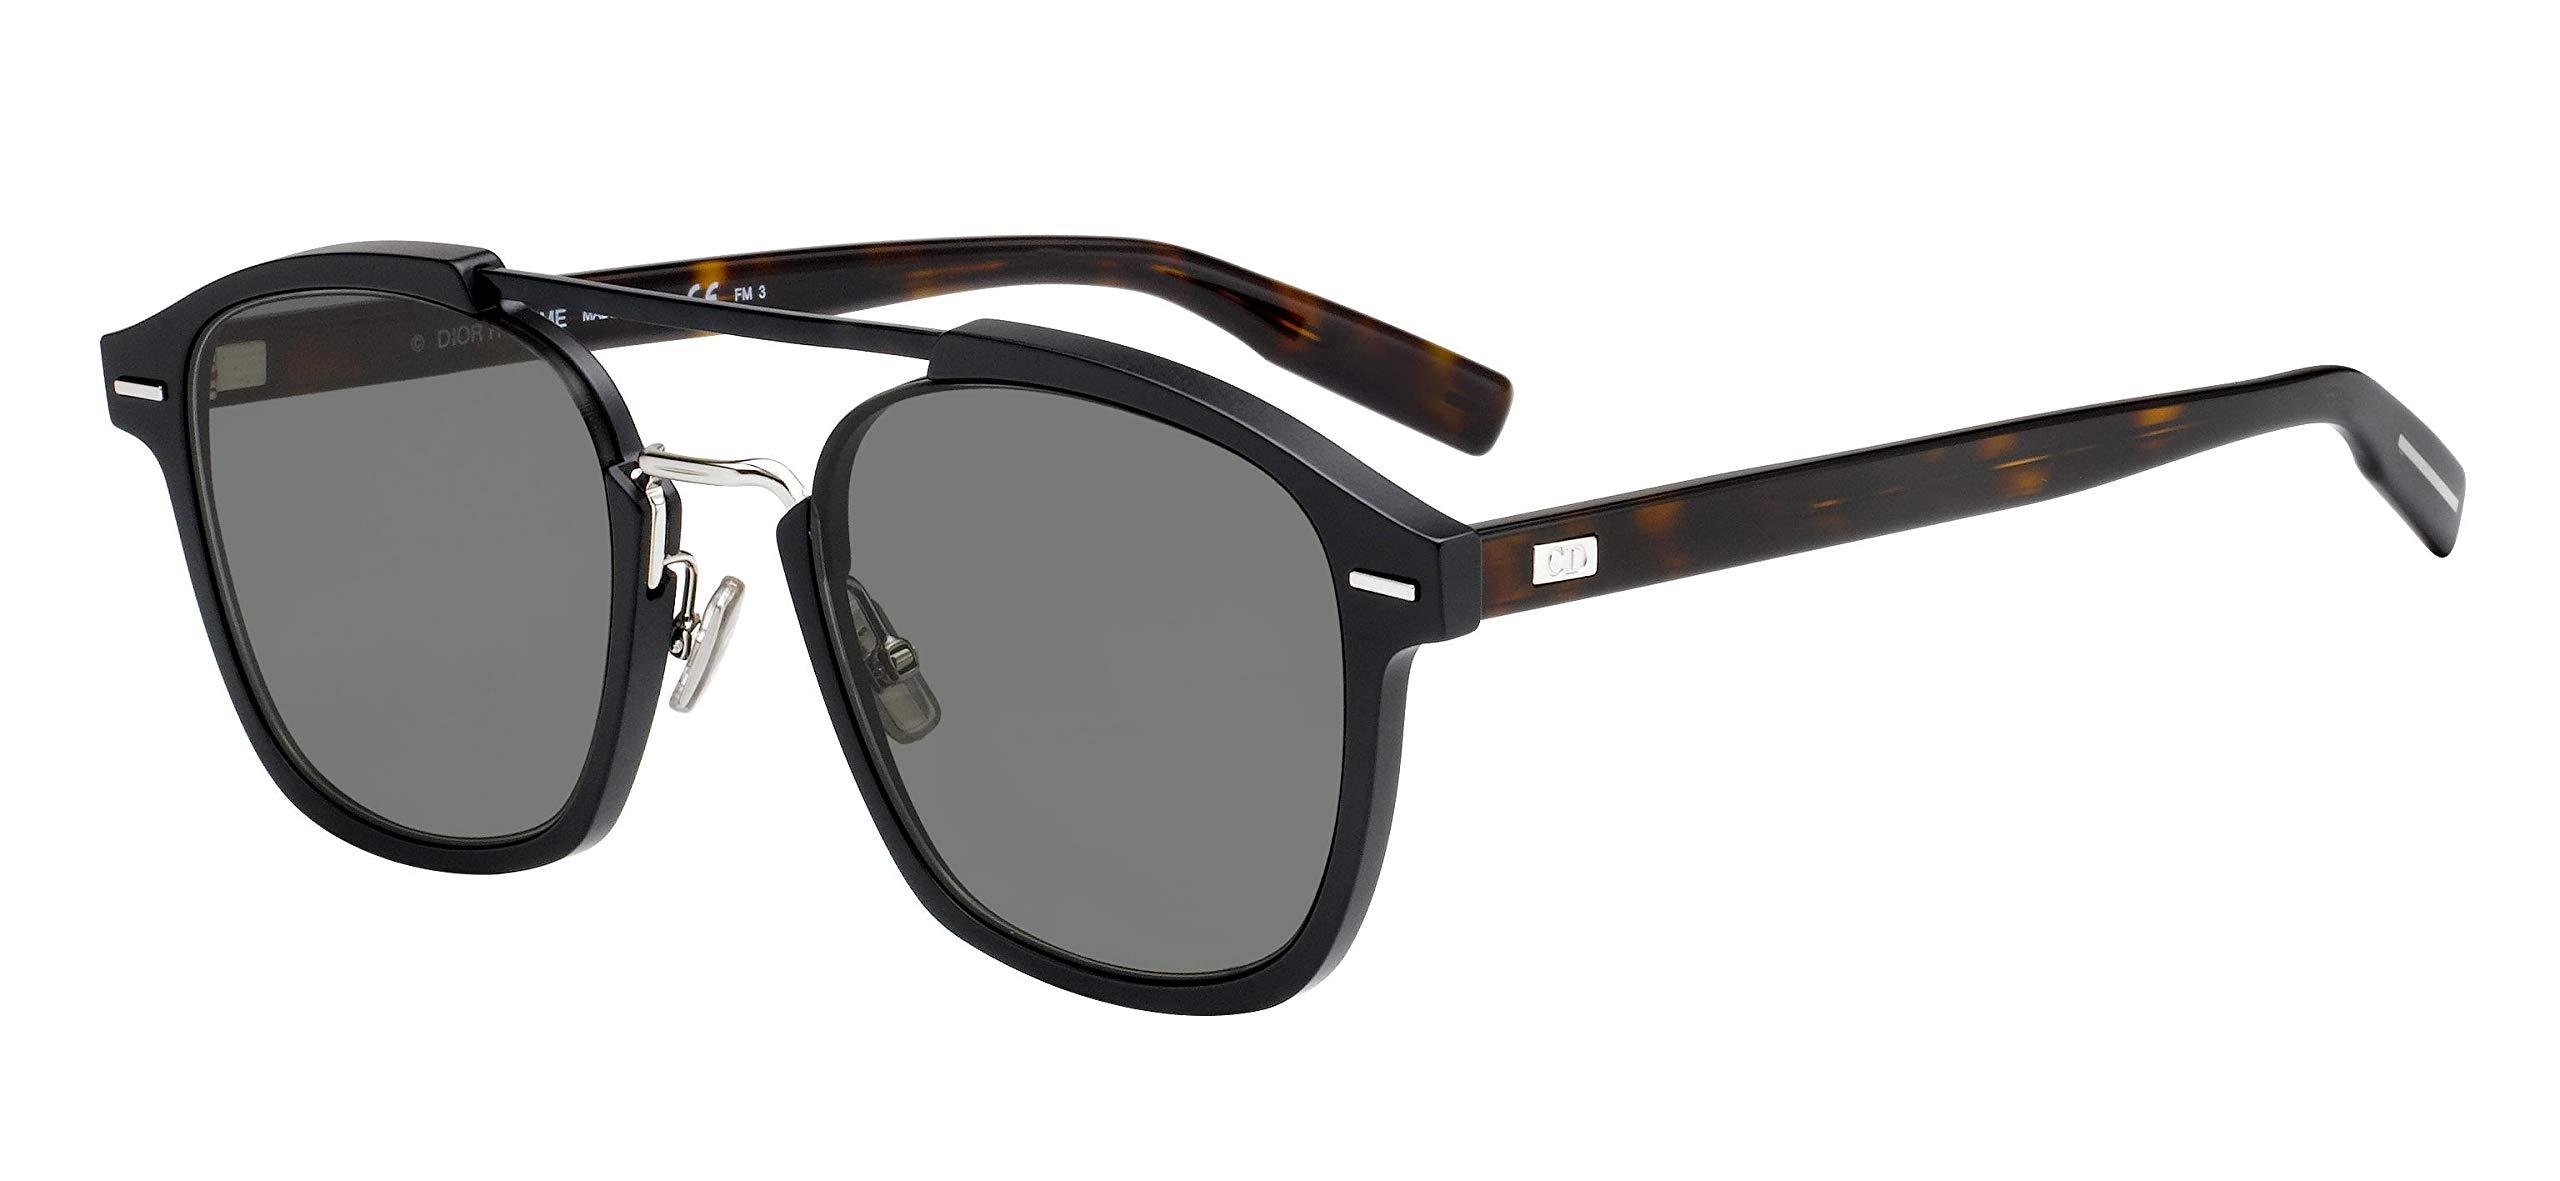 Dior Homme AL13.13 WR7 Black/Havana AL13.13 Square Sunglasses Lens Category 3